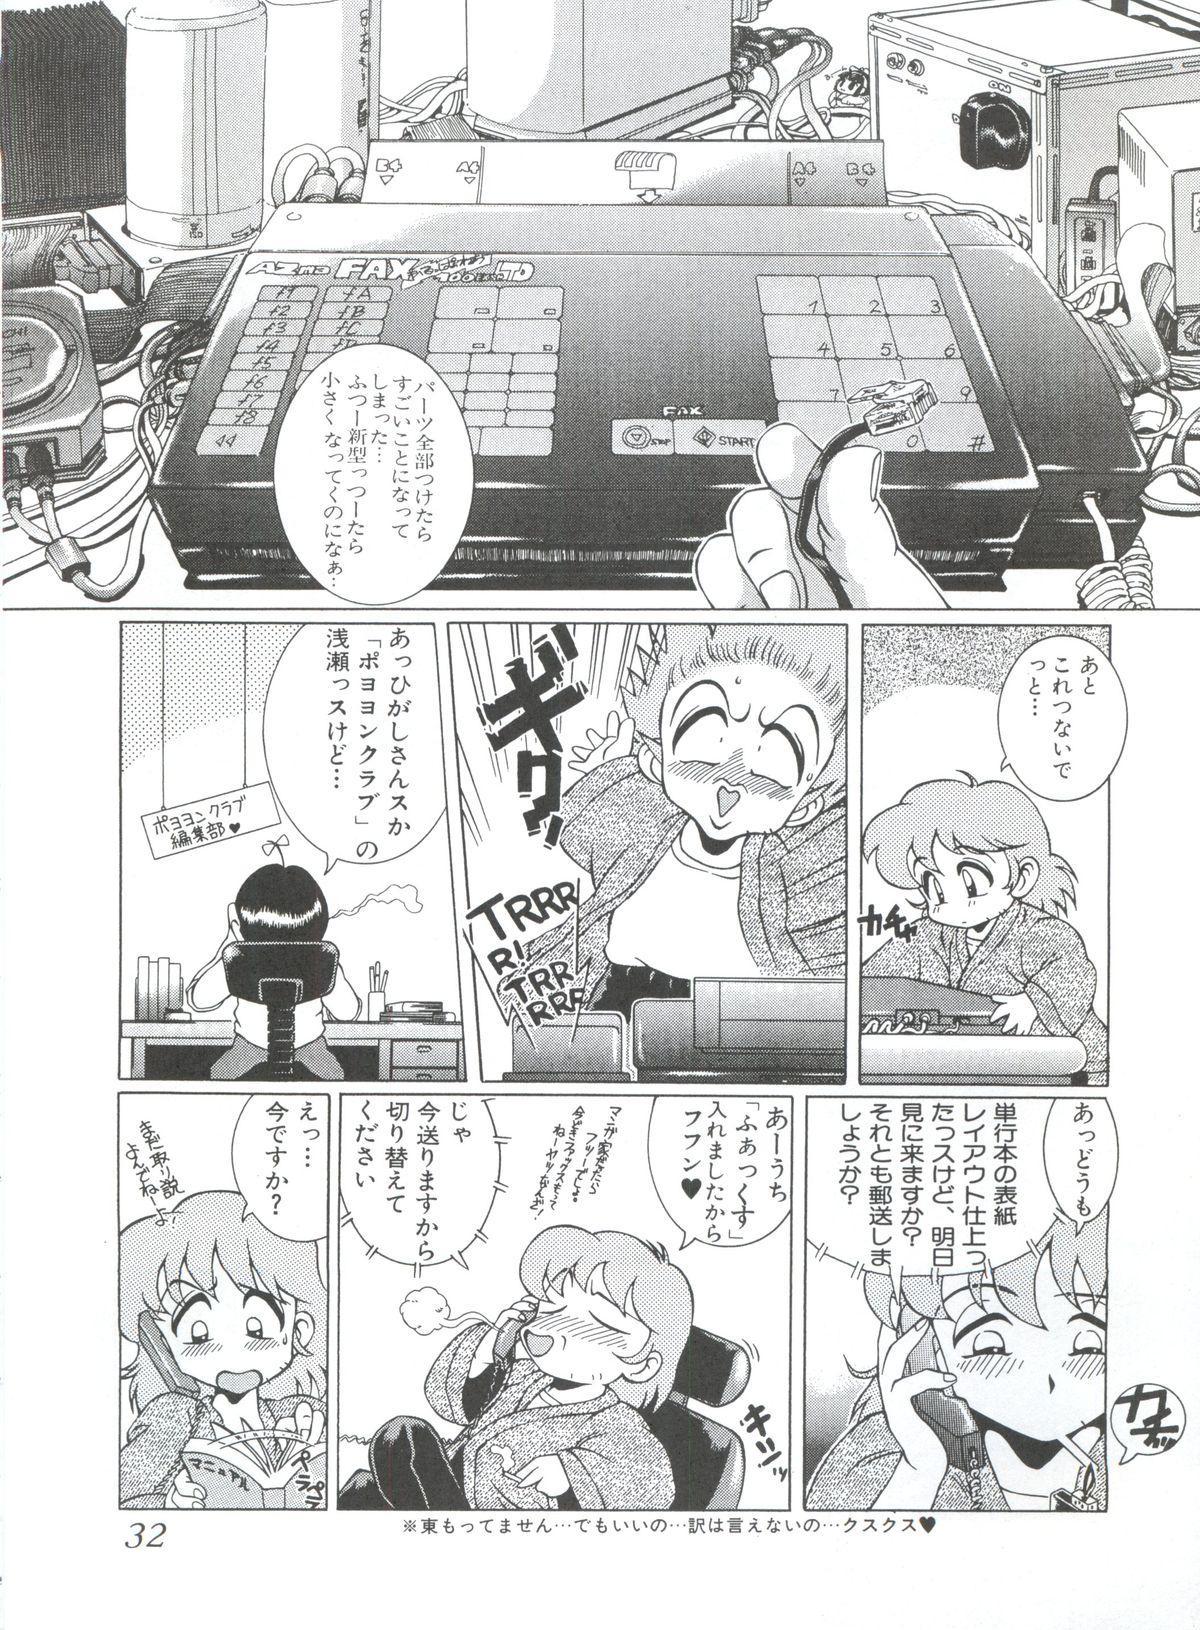 Meika Azumaya Vol.4 30